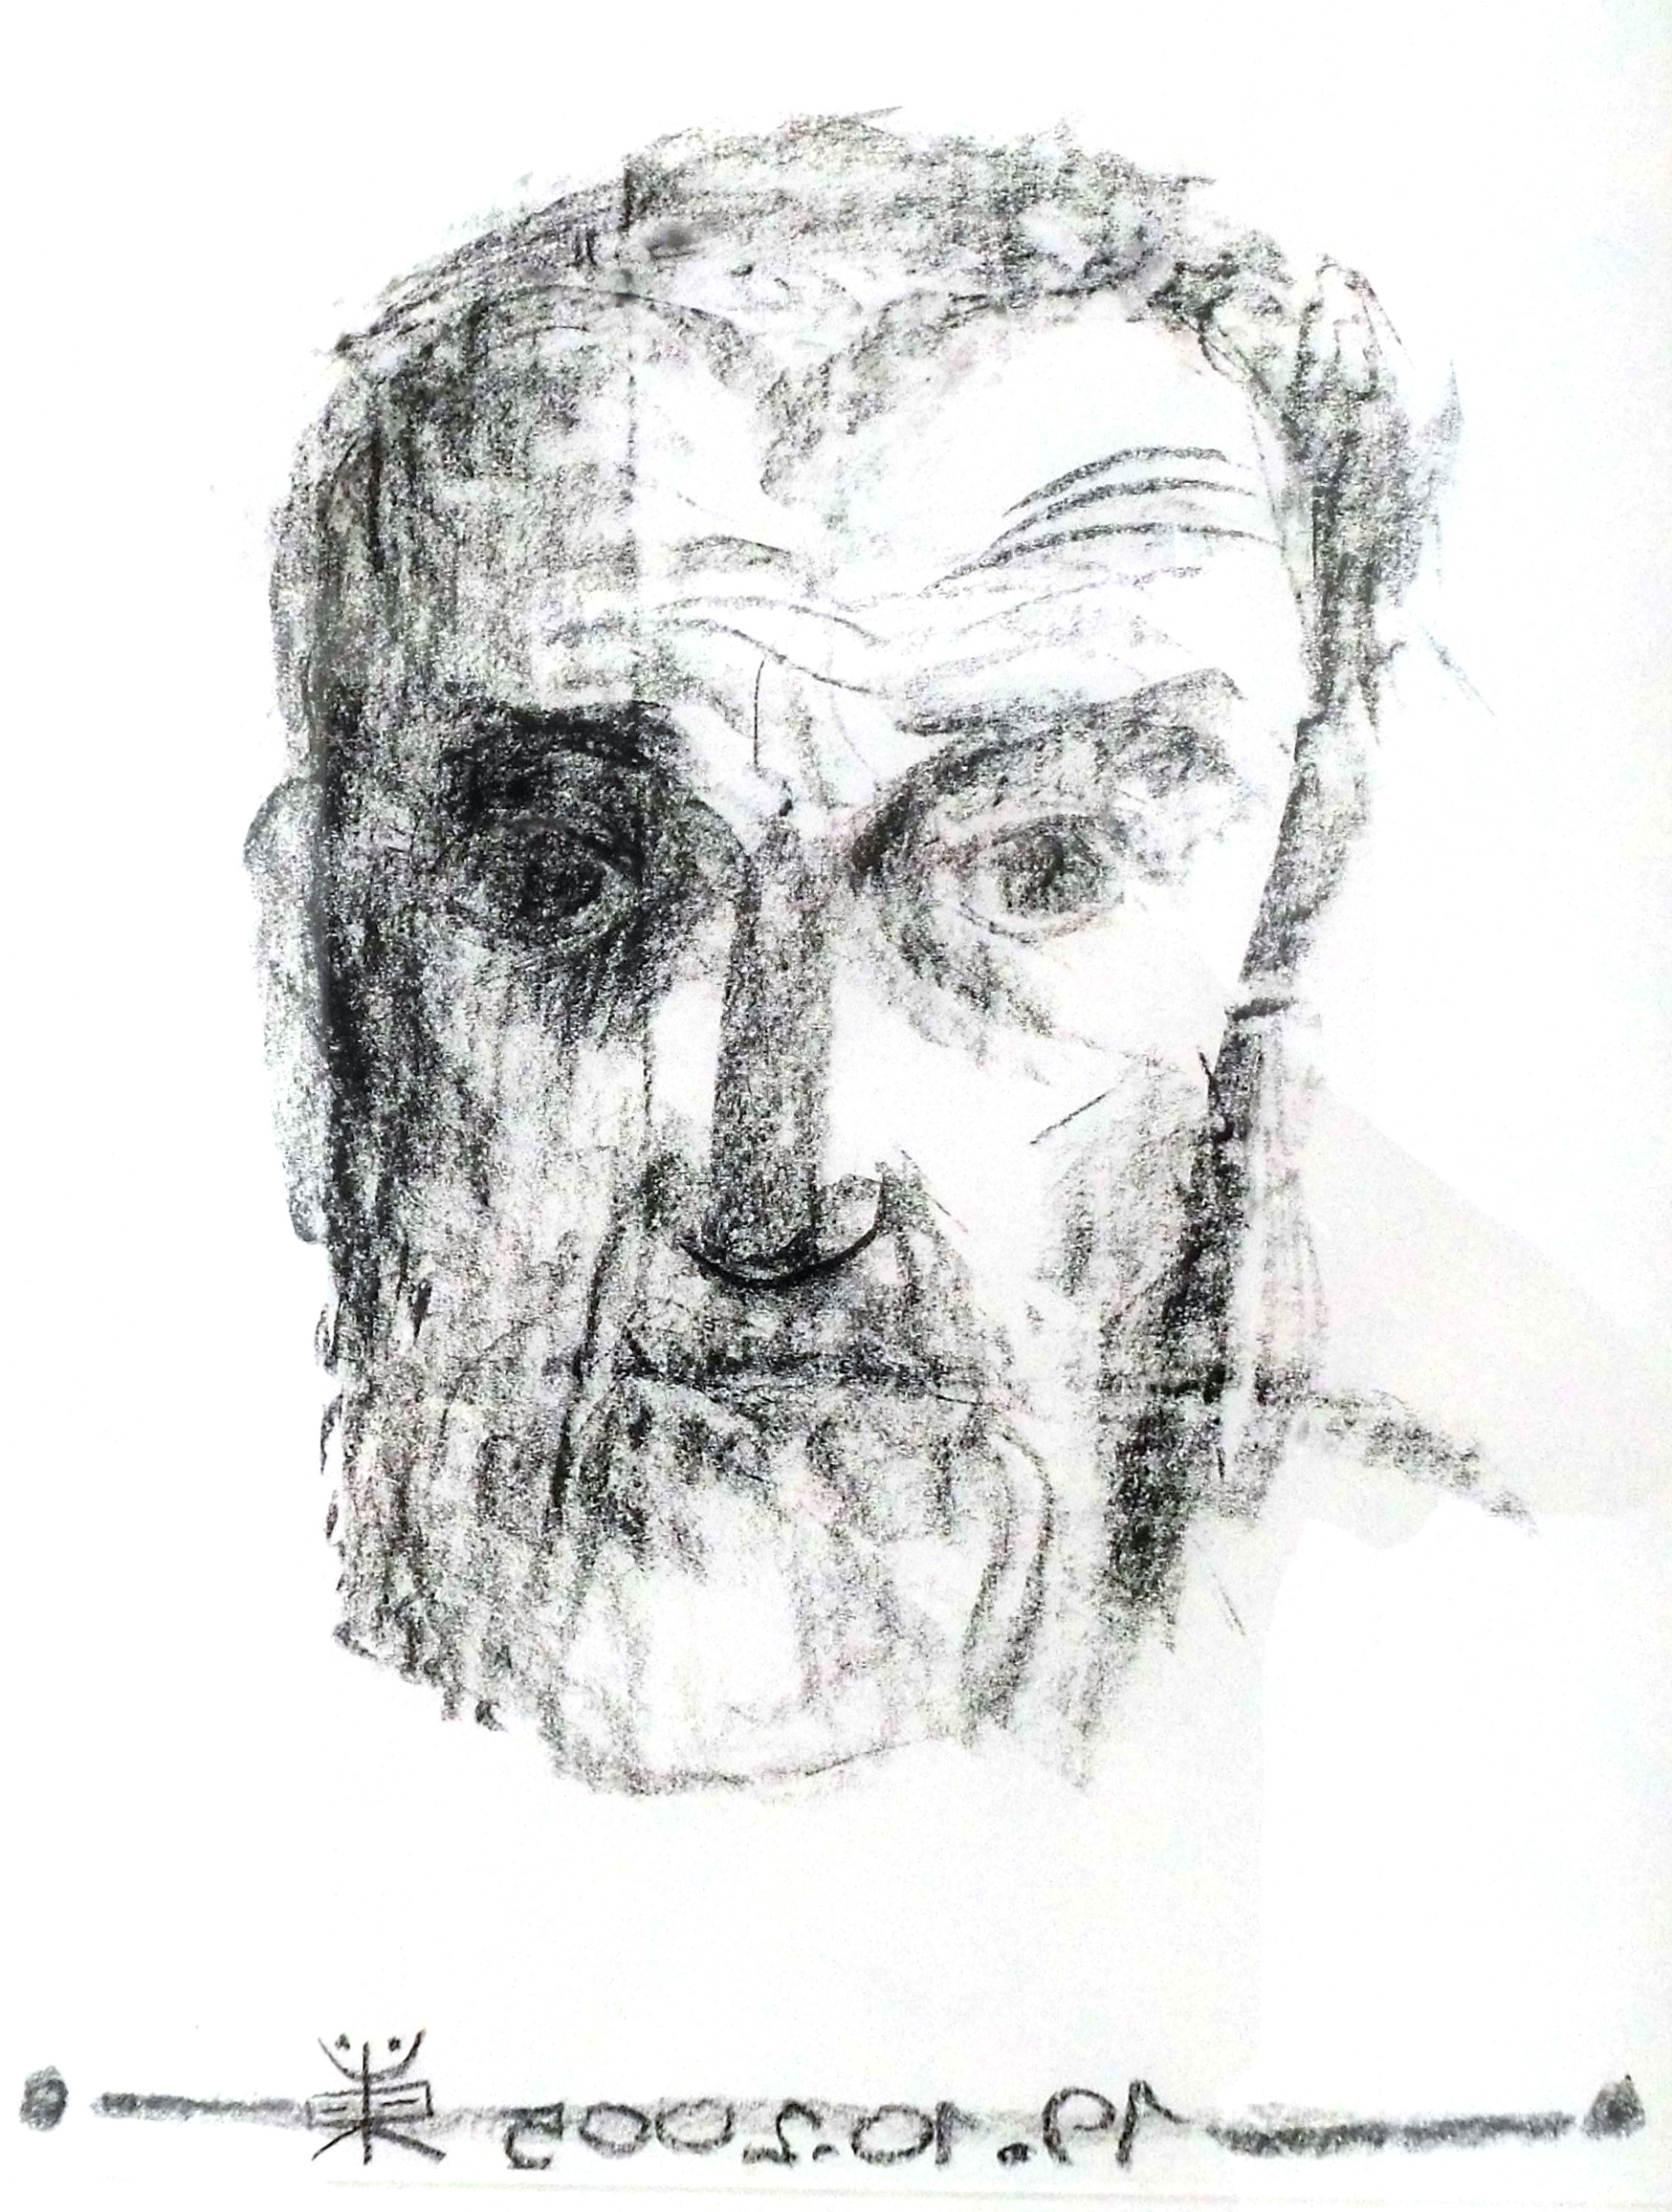 02-stefan_plenkers-portraet_rainer_zille-2005-kohle-58-5x42